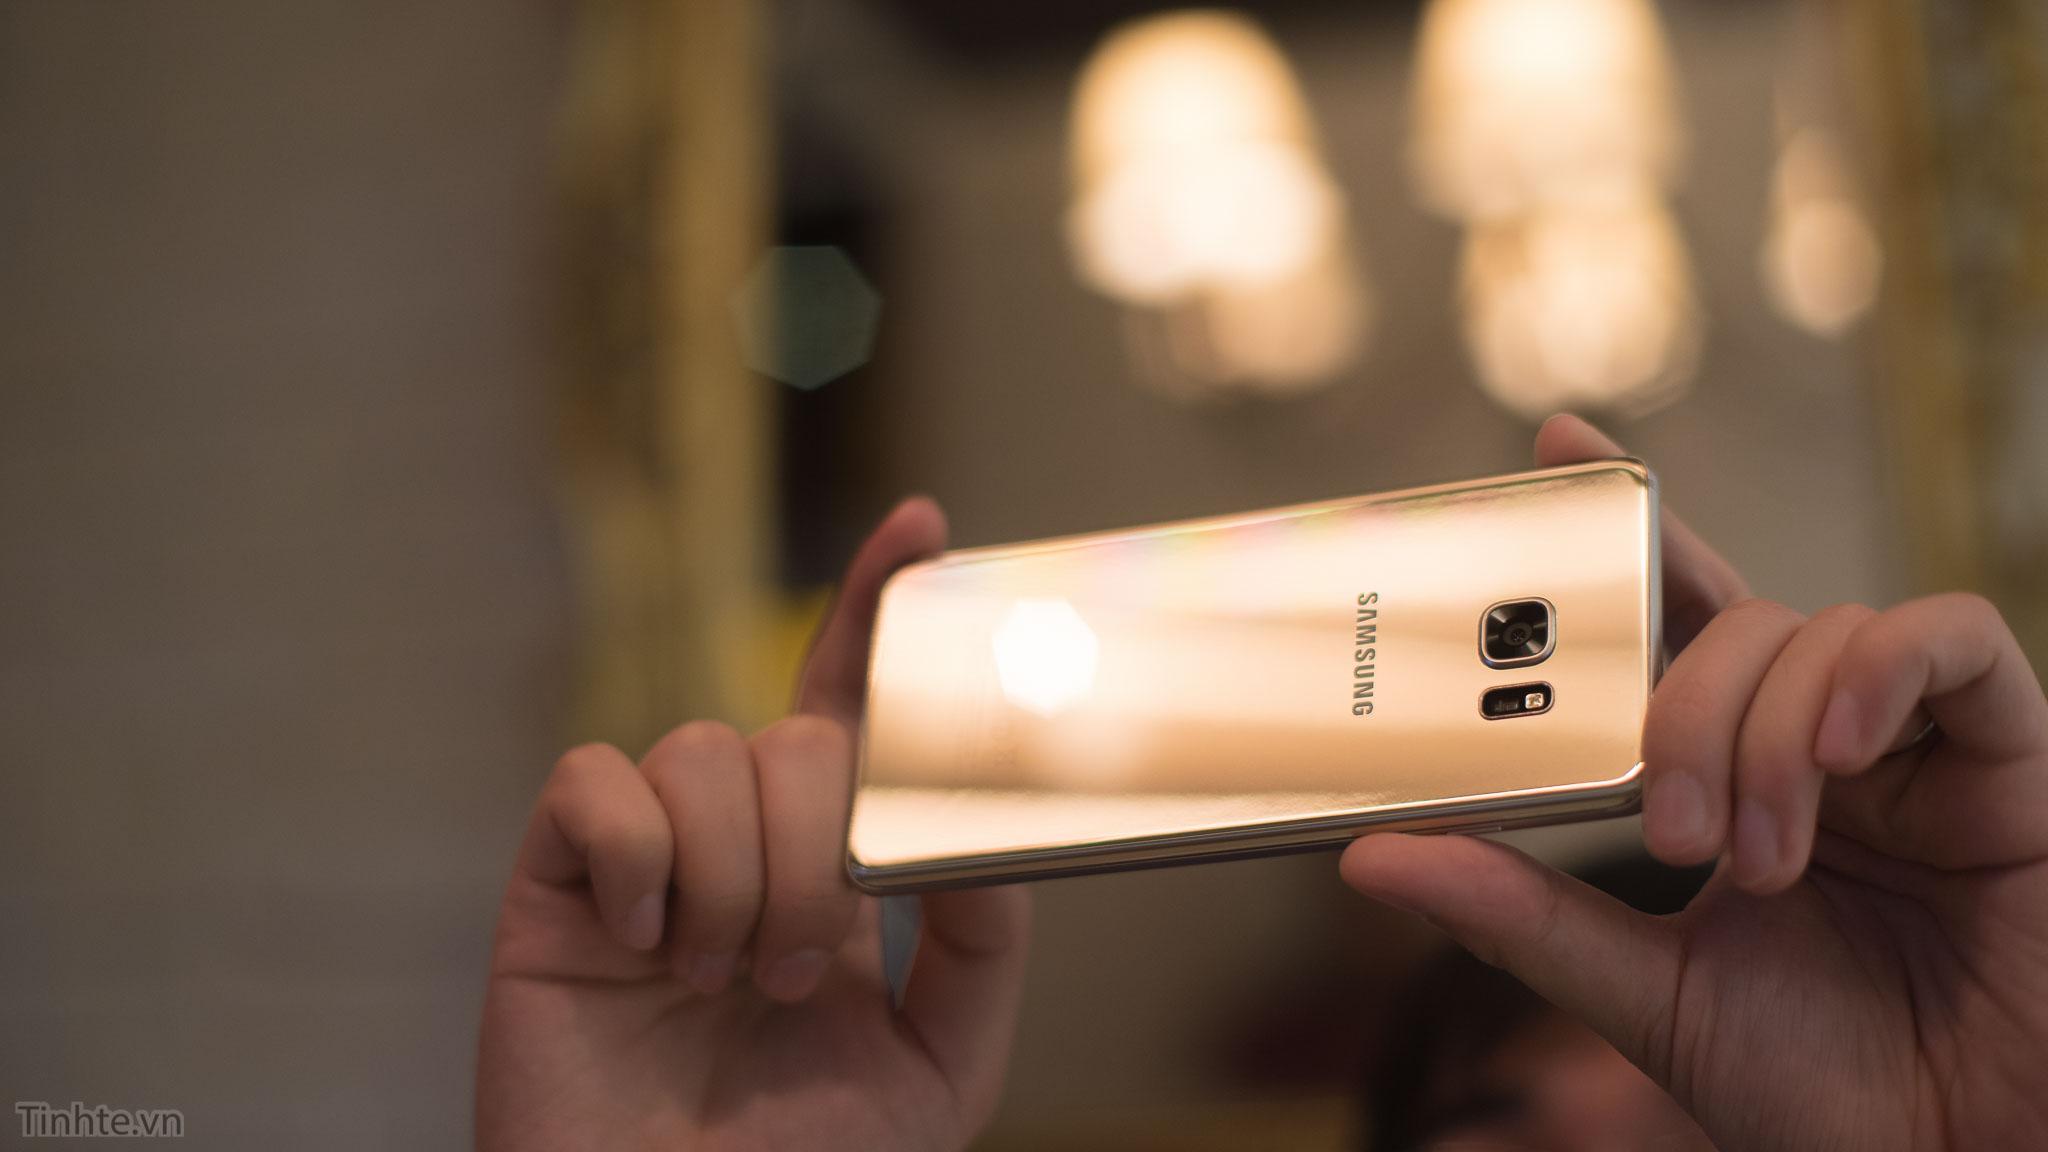 Samsung_Galaxy_Note_7_review_tinhte.vn-8.jpg